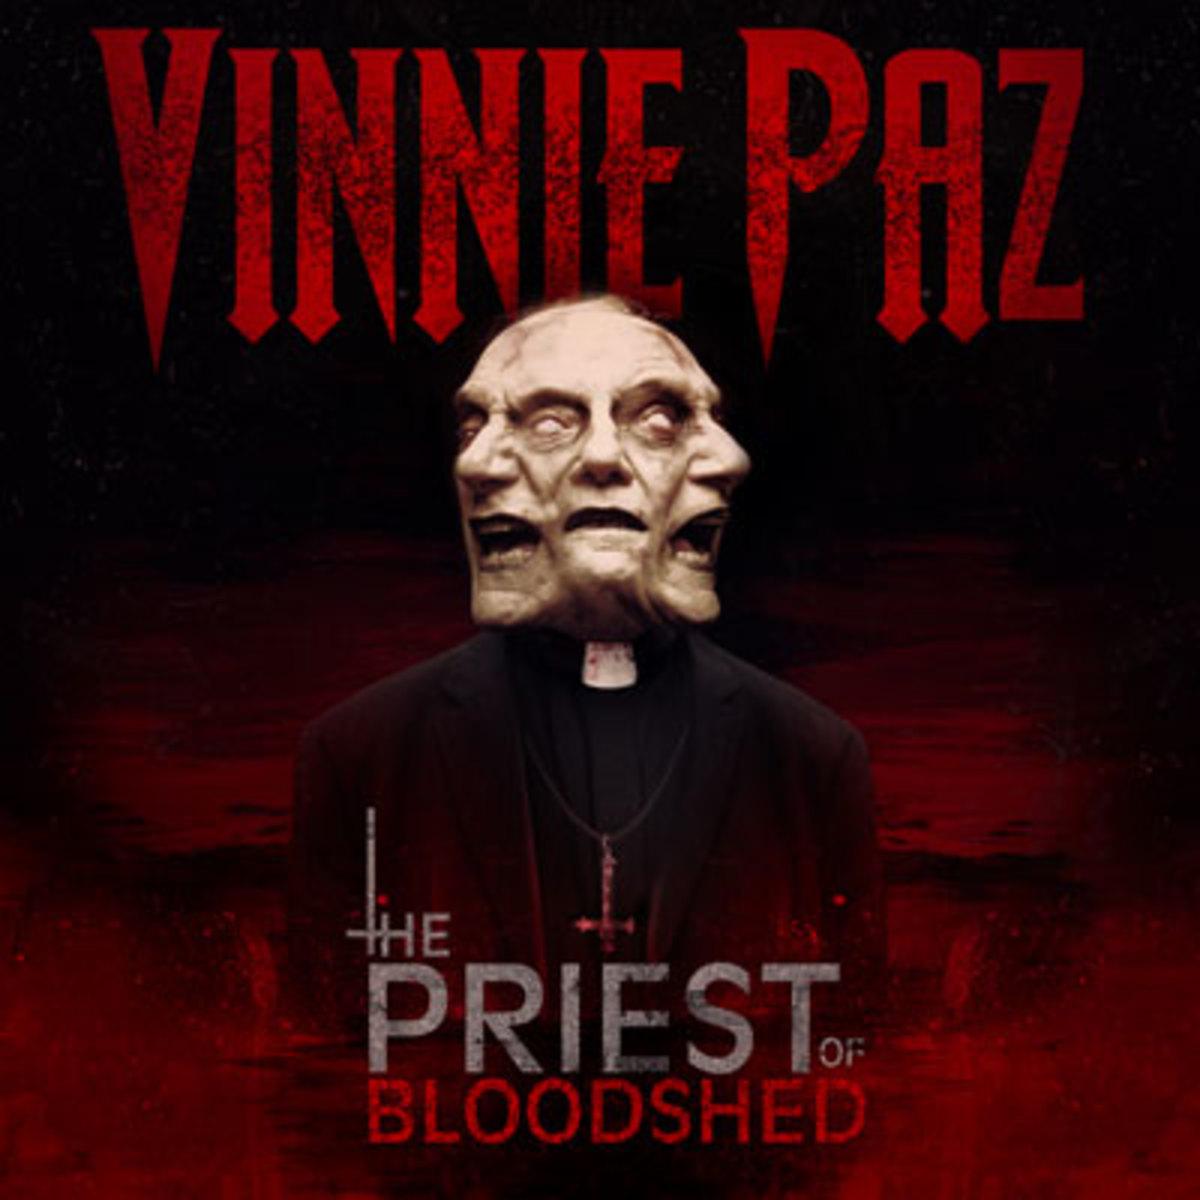 vinniepaz-priest.jpg